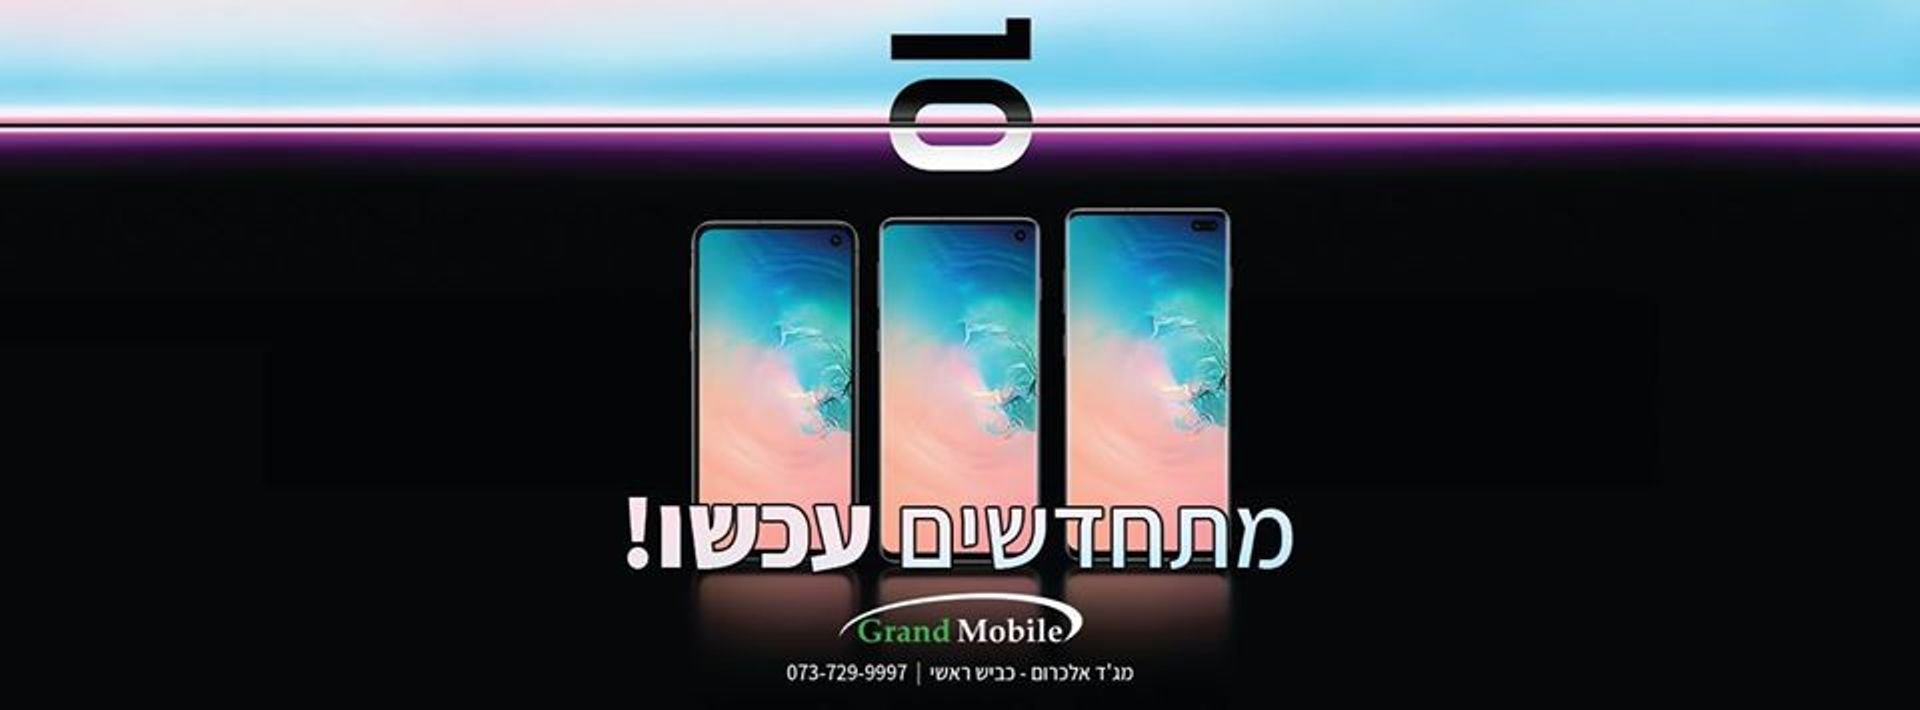 20 Grand mobile תְמוּנָה